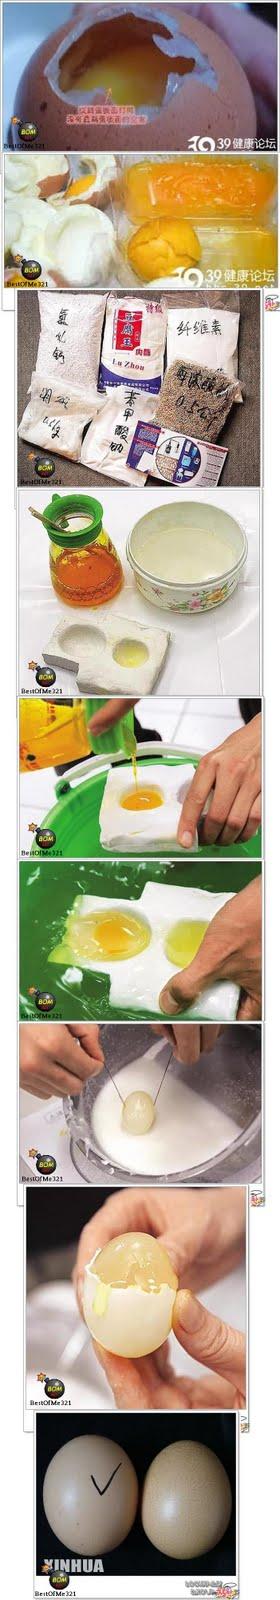 telur ayam tiruan